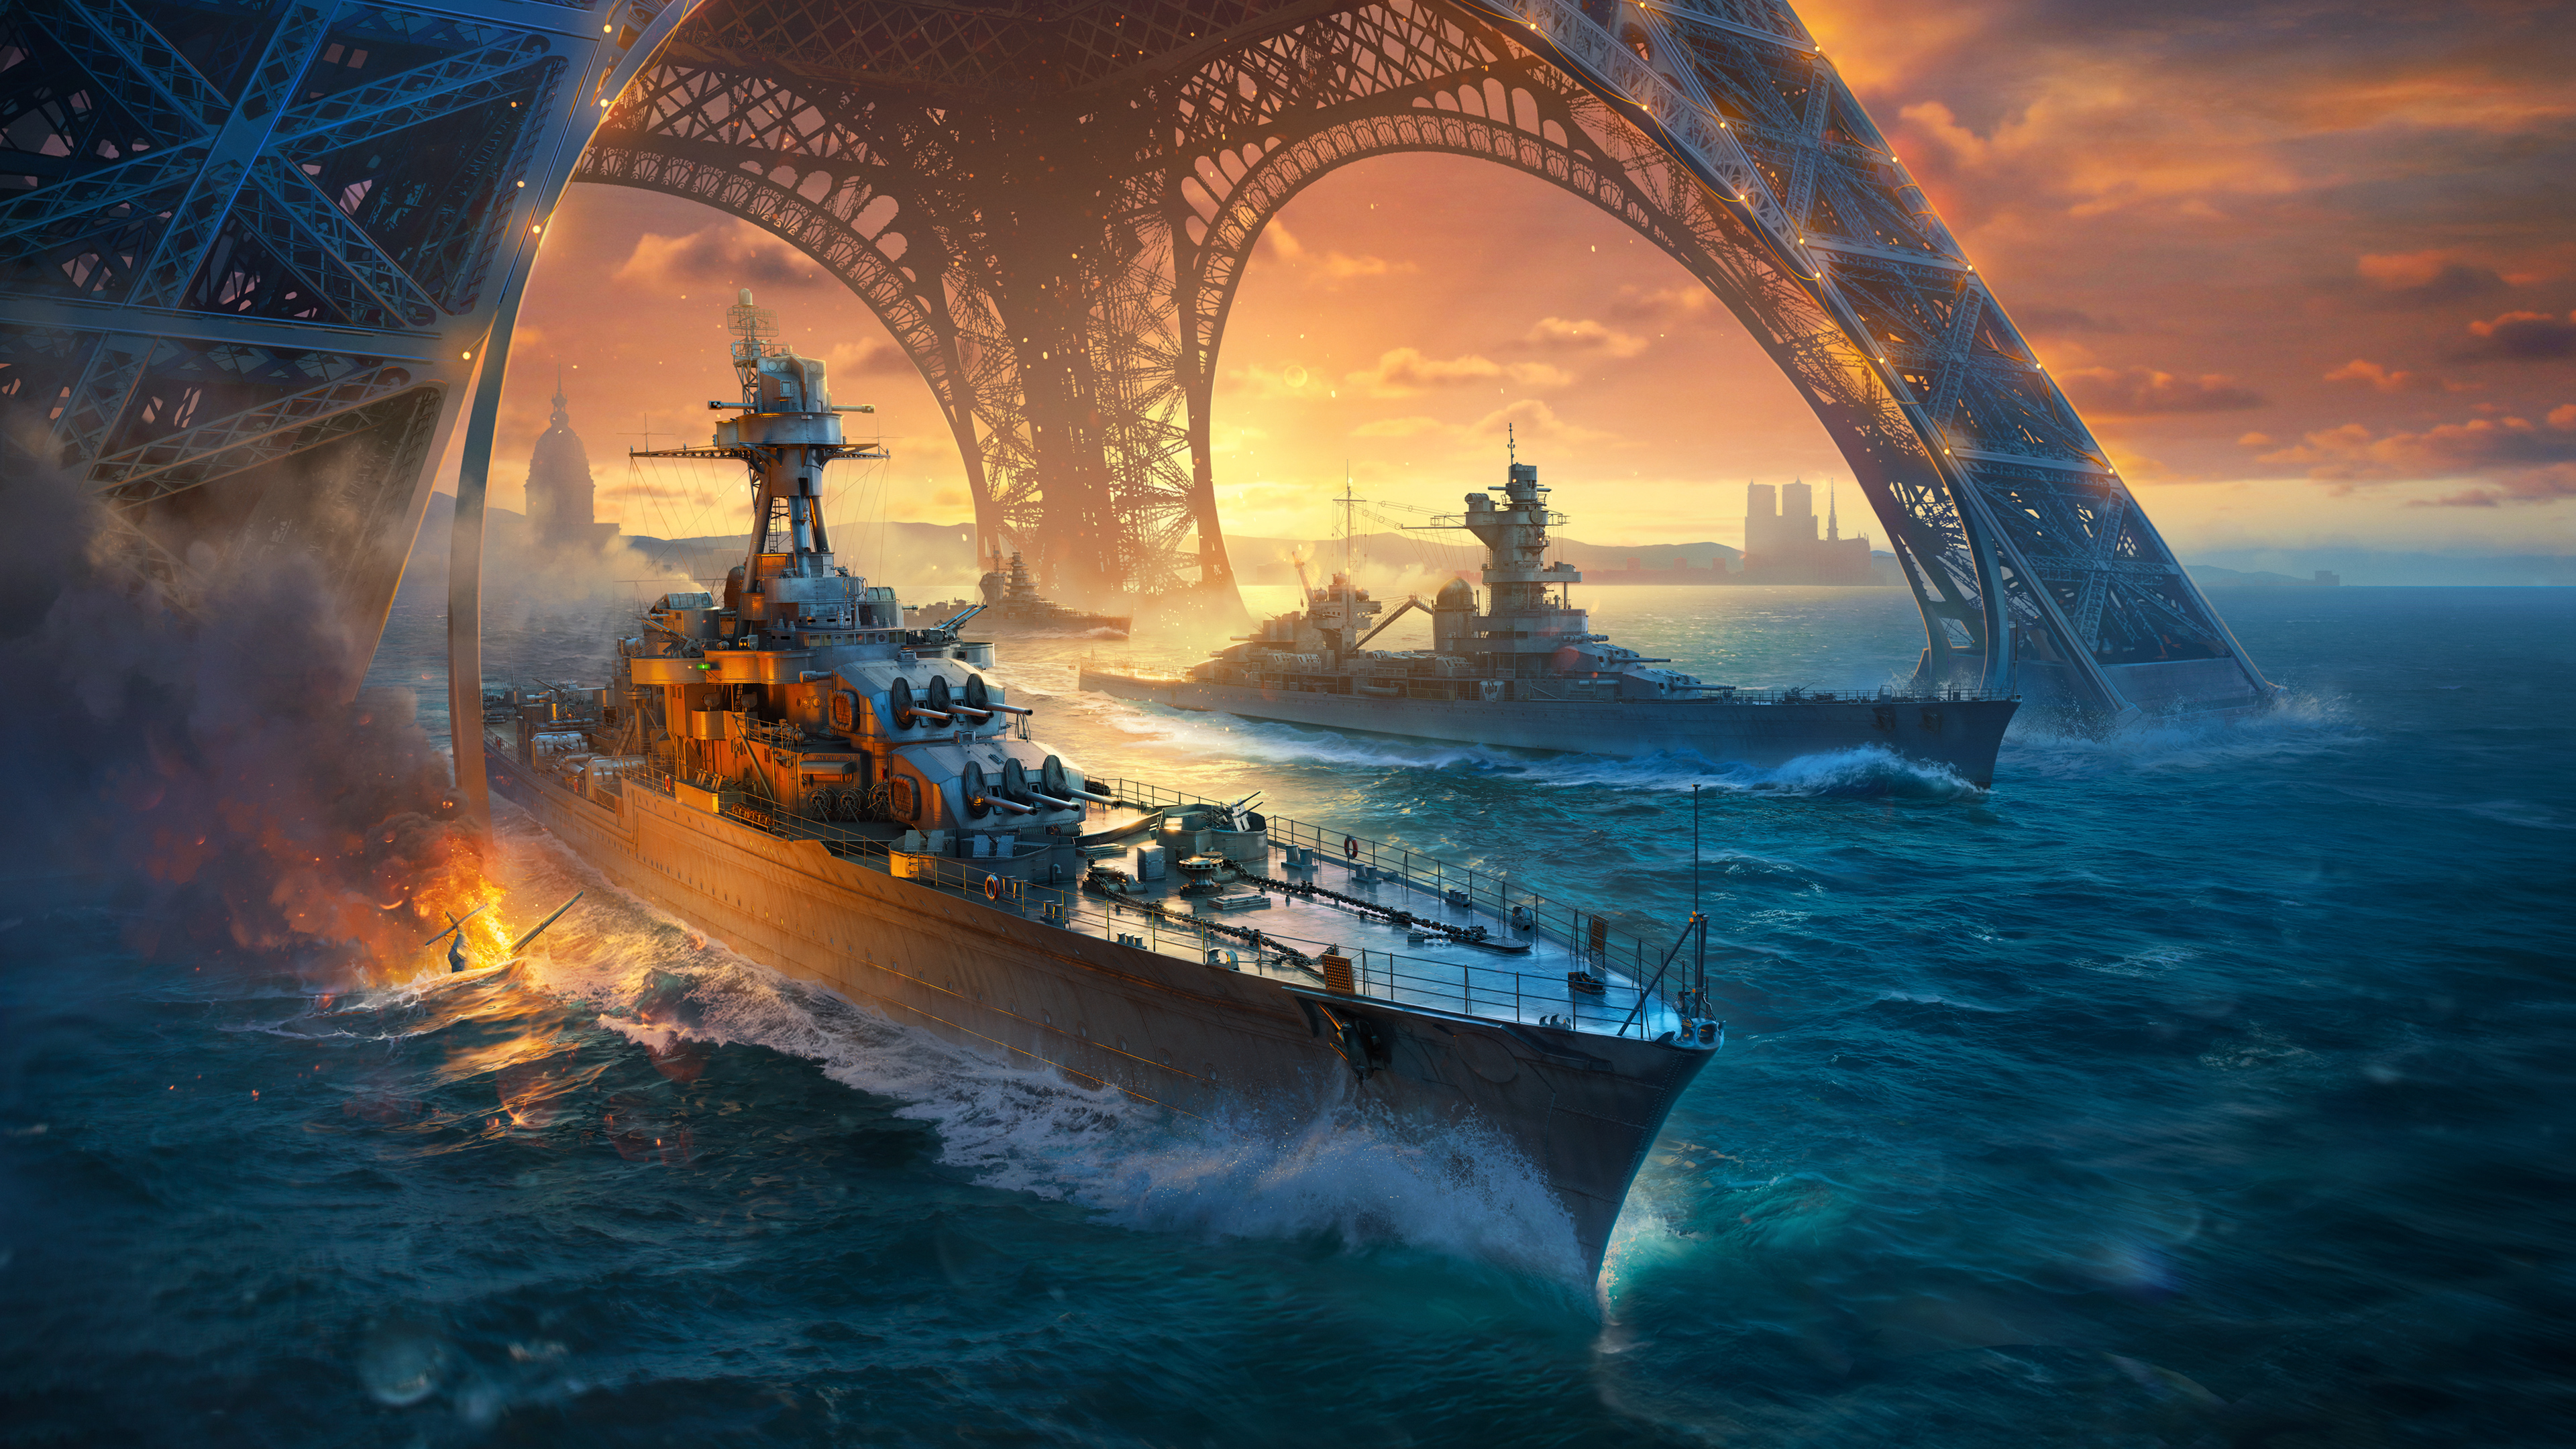 world of warships game 4k 1541294947 - World Of Warships Game 4k - xbox games wallpapers, world of warships wallpapers, ps games wallpapers, pc games wallpapers, hd-wallpapers, games wallpapers, 4k-wallpapers